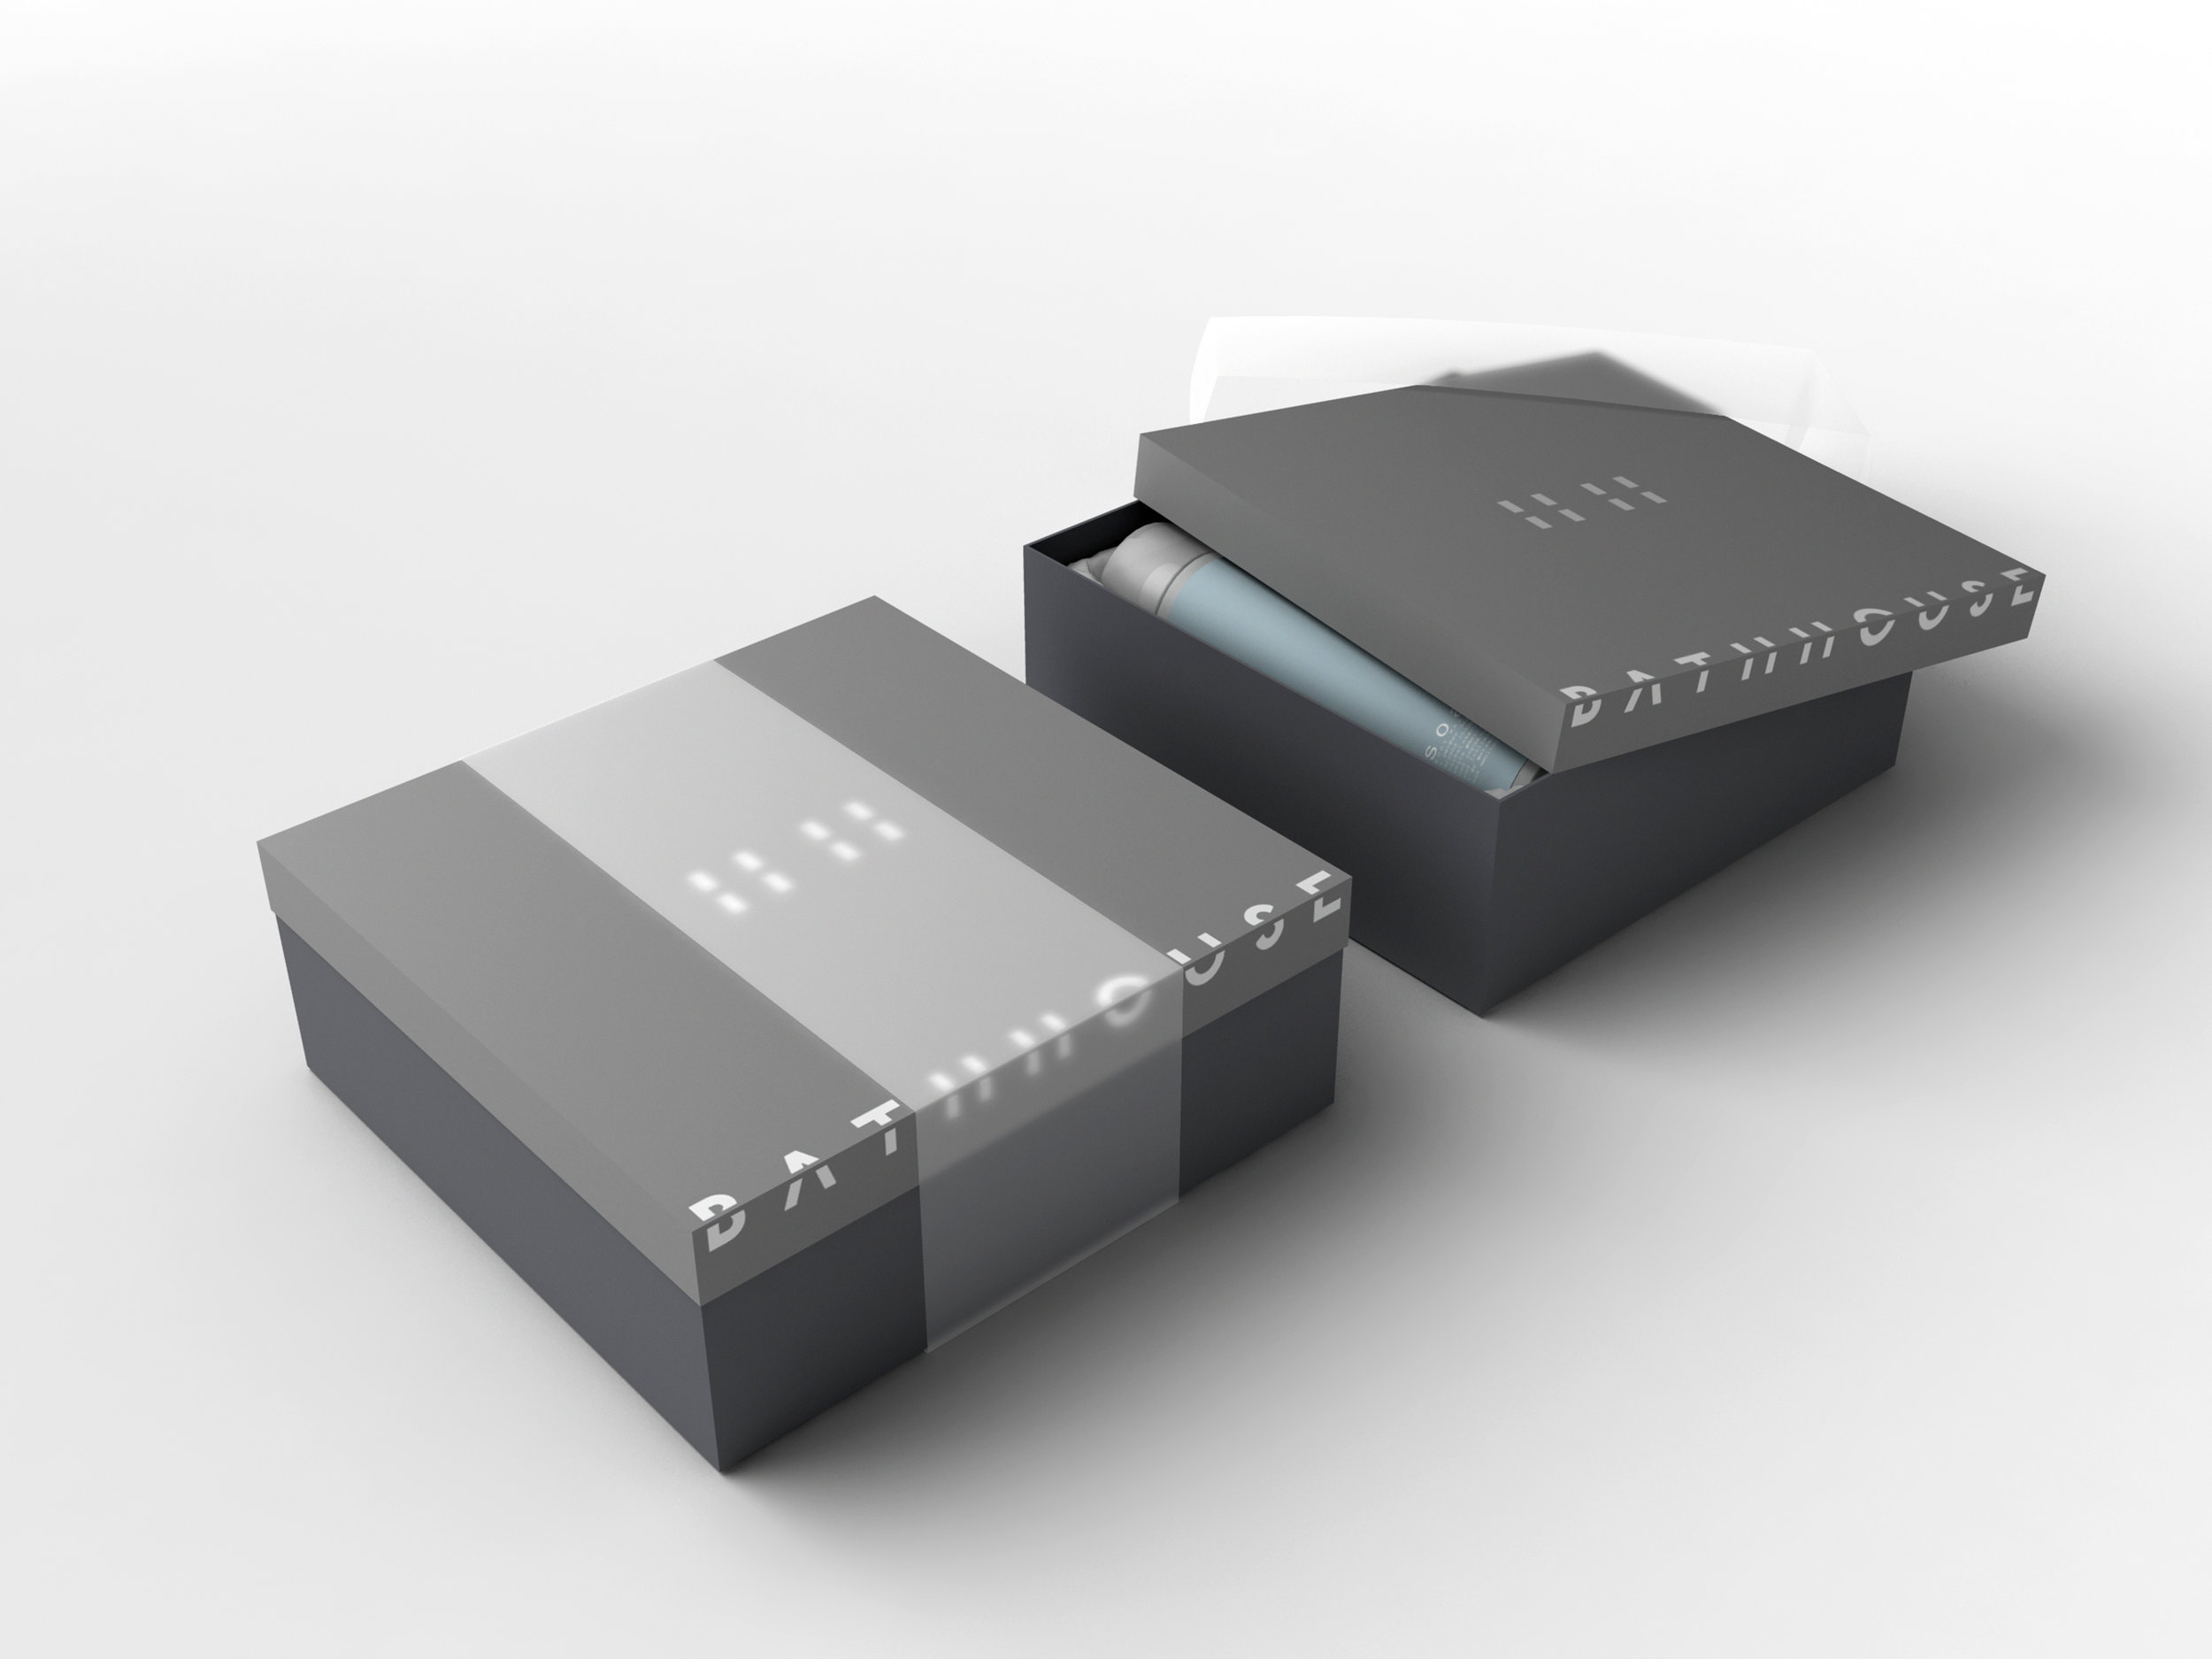 box2-11x17.jpg